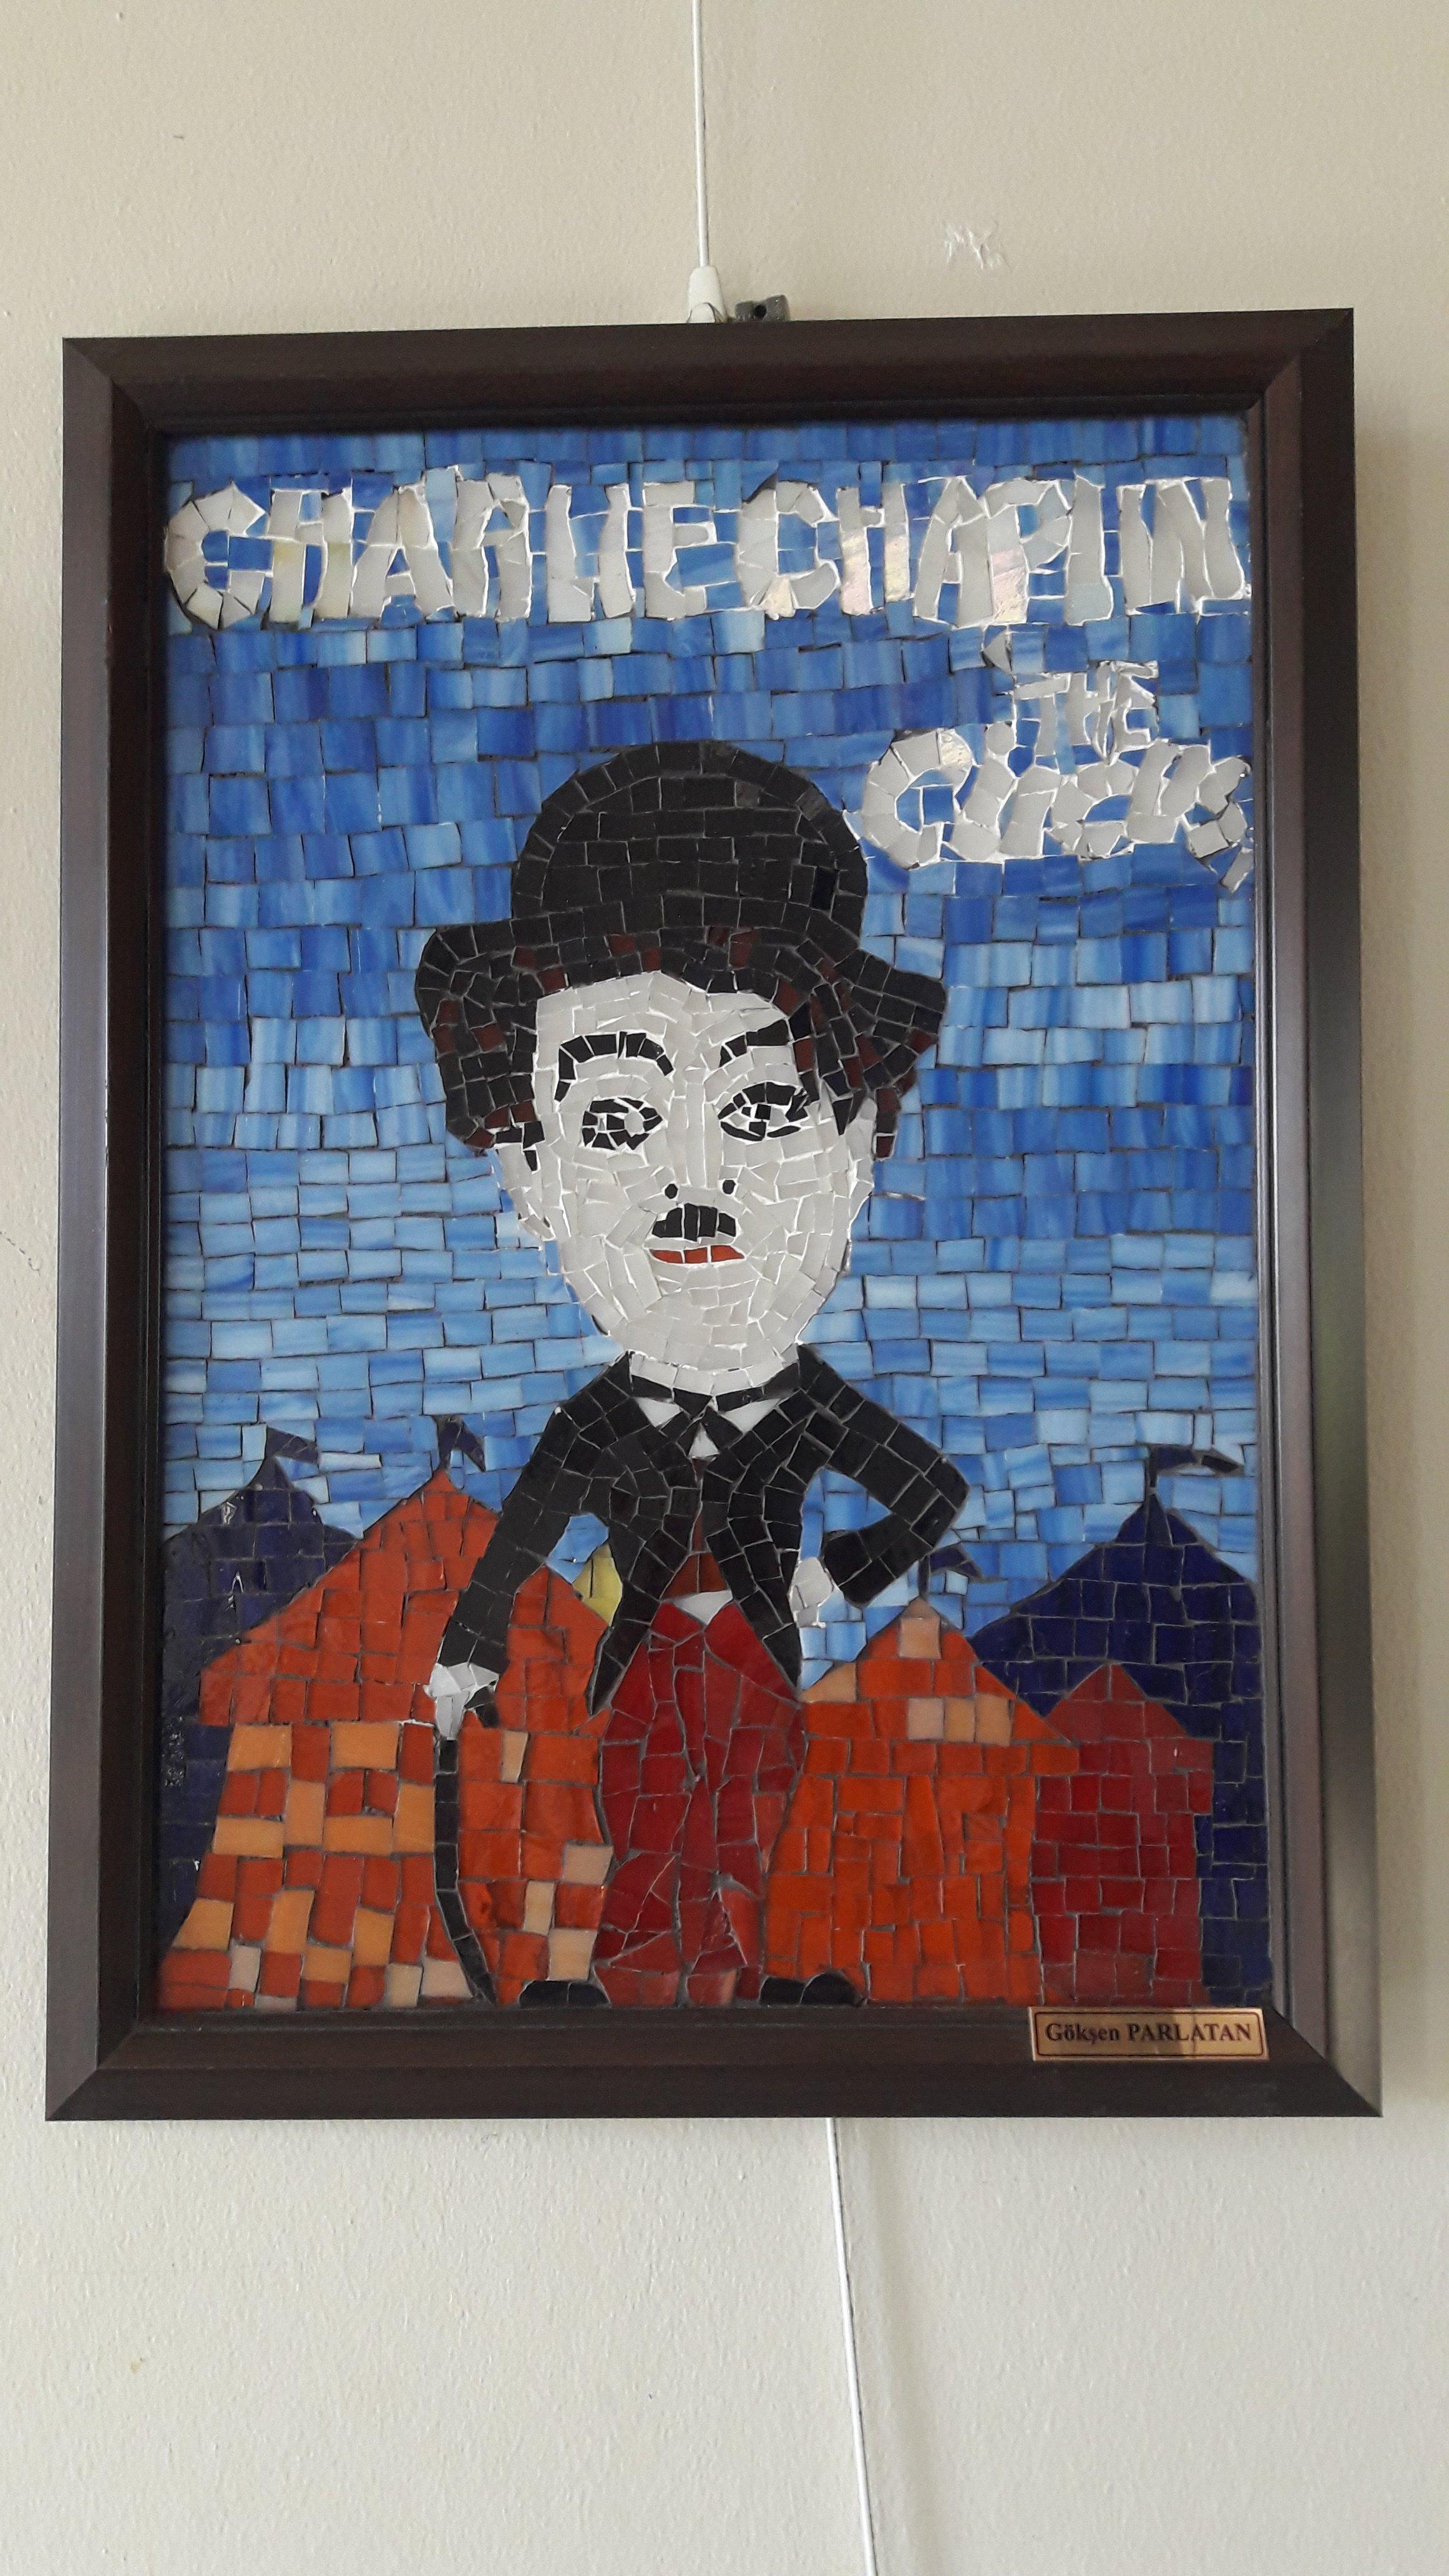 Charlie Chaplin mozaik